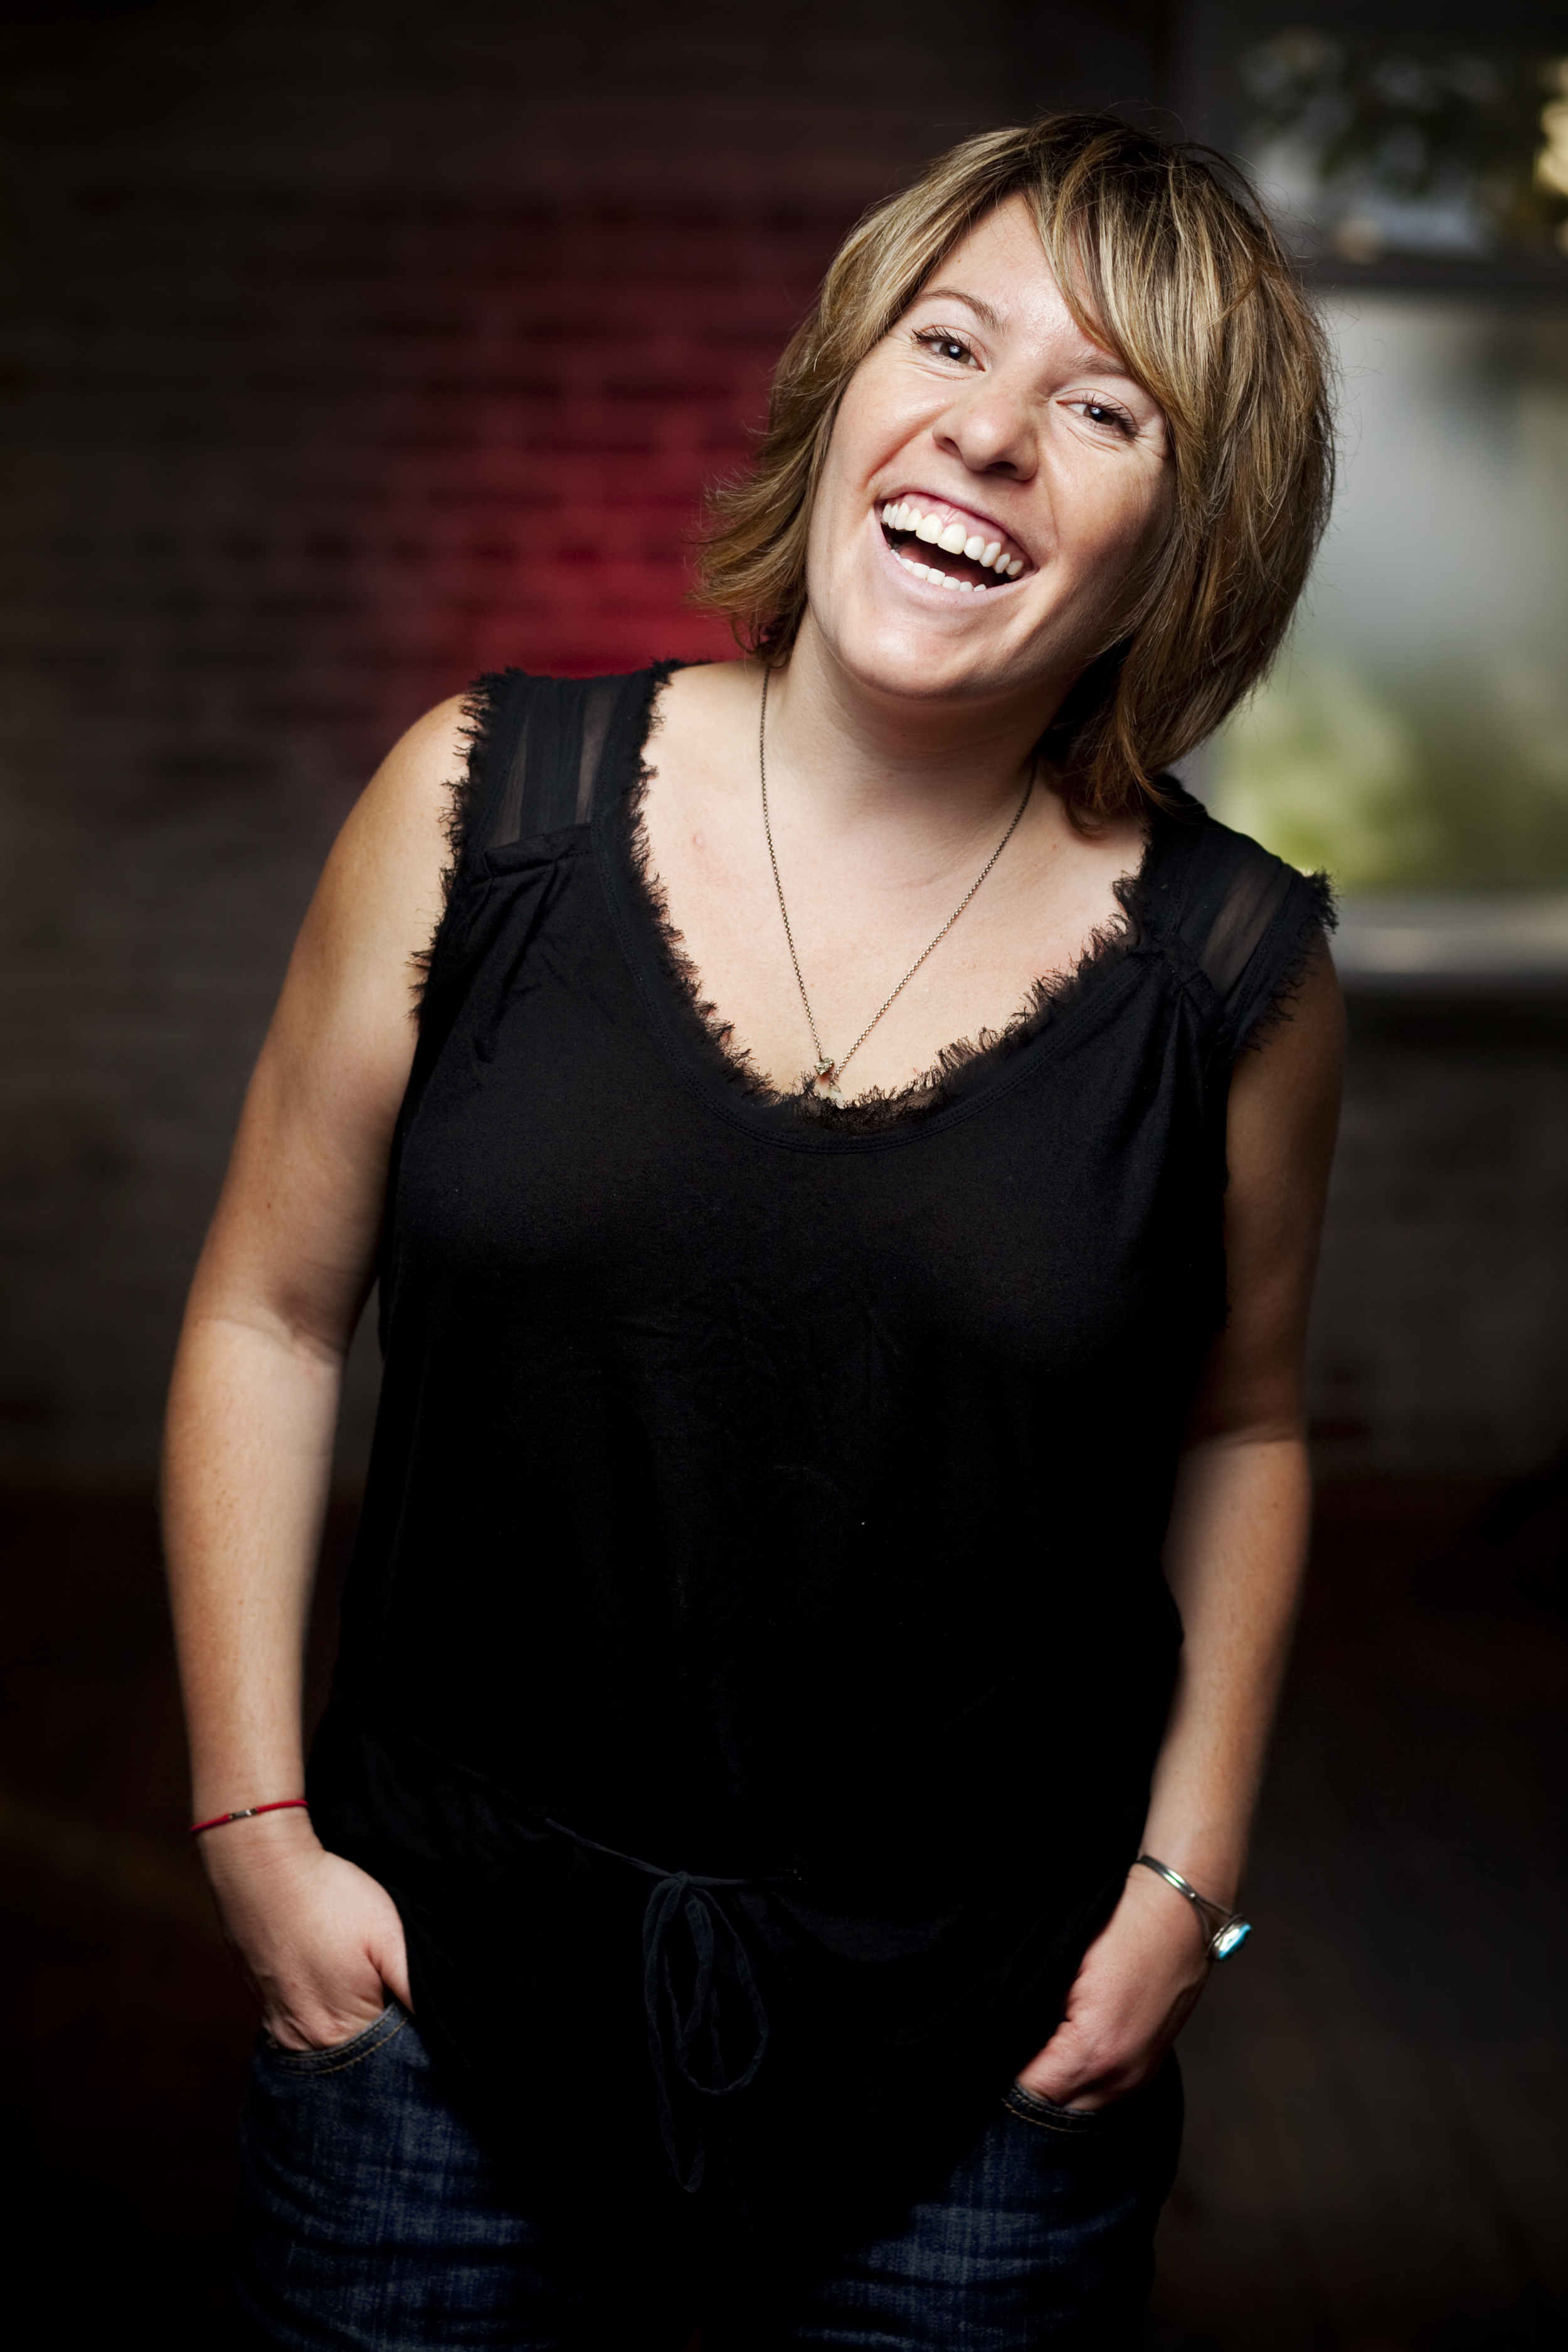 Abby Greenawalt, Photographer